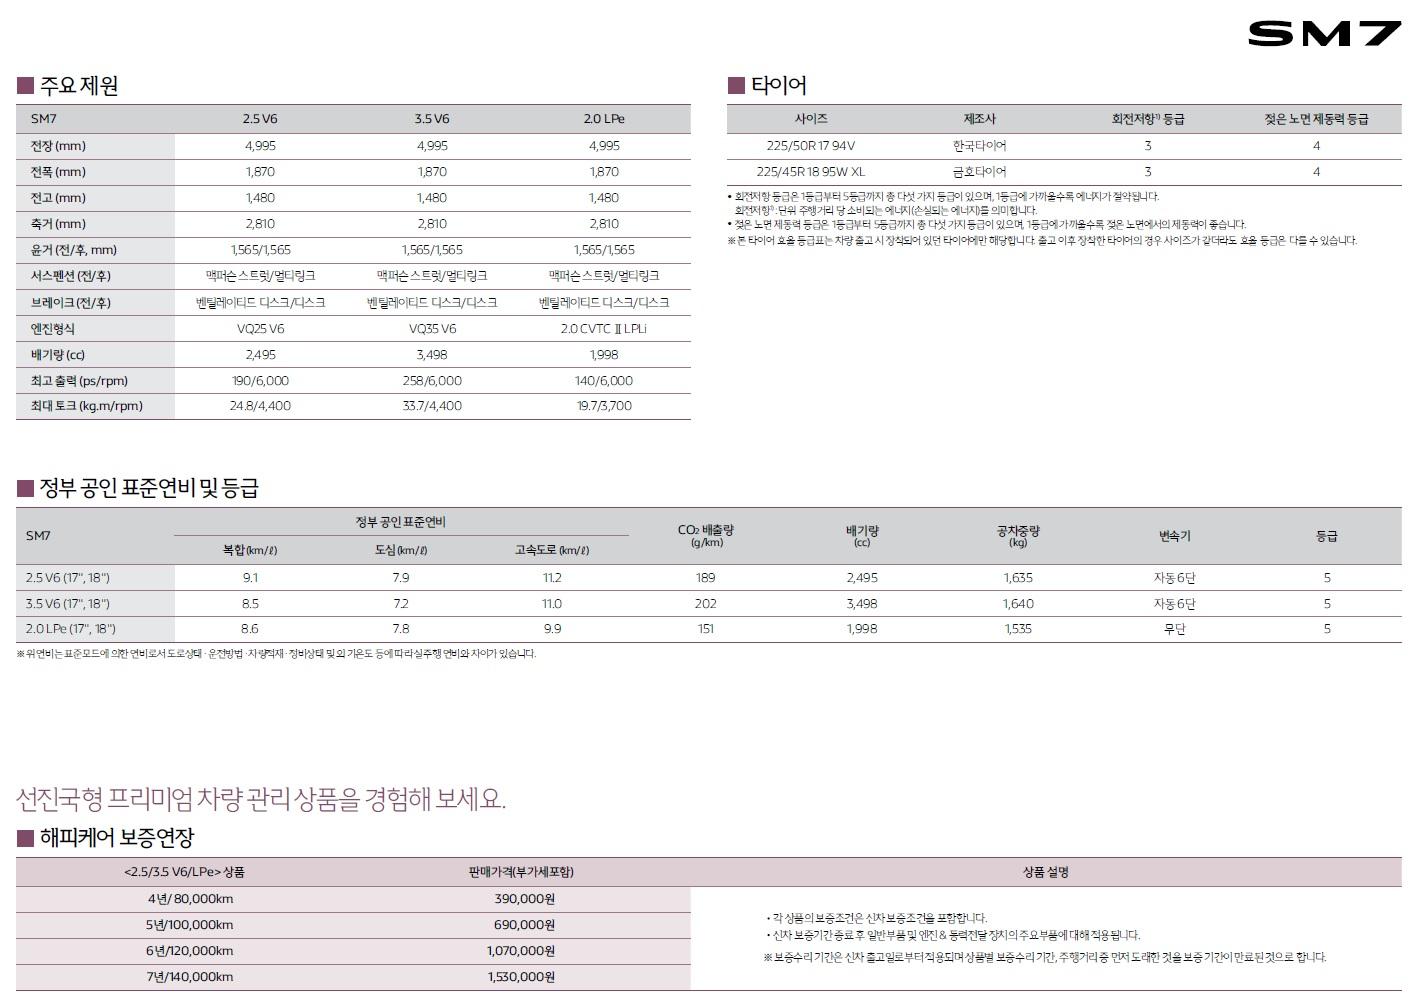 SM7 가격표 - 2018년 04월 -4.jpg